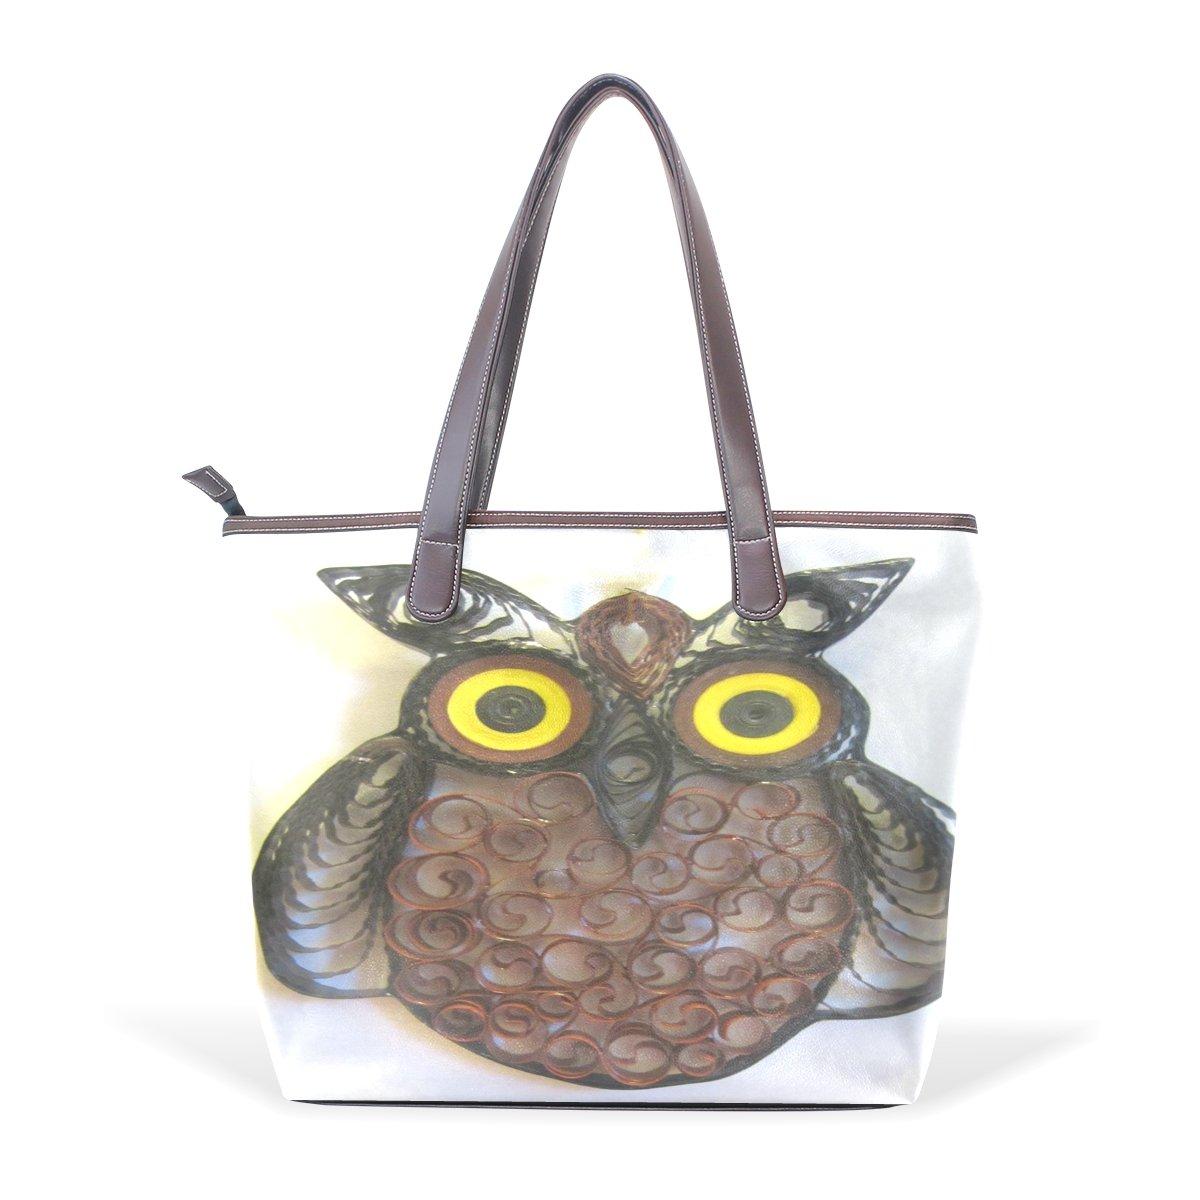 Ye Store Owl Lady PU Leather Handbag Tote Bag Shoulder Bag Shopping Bag